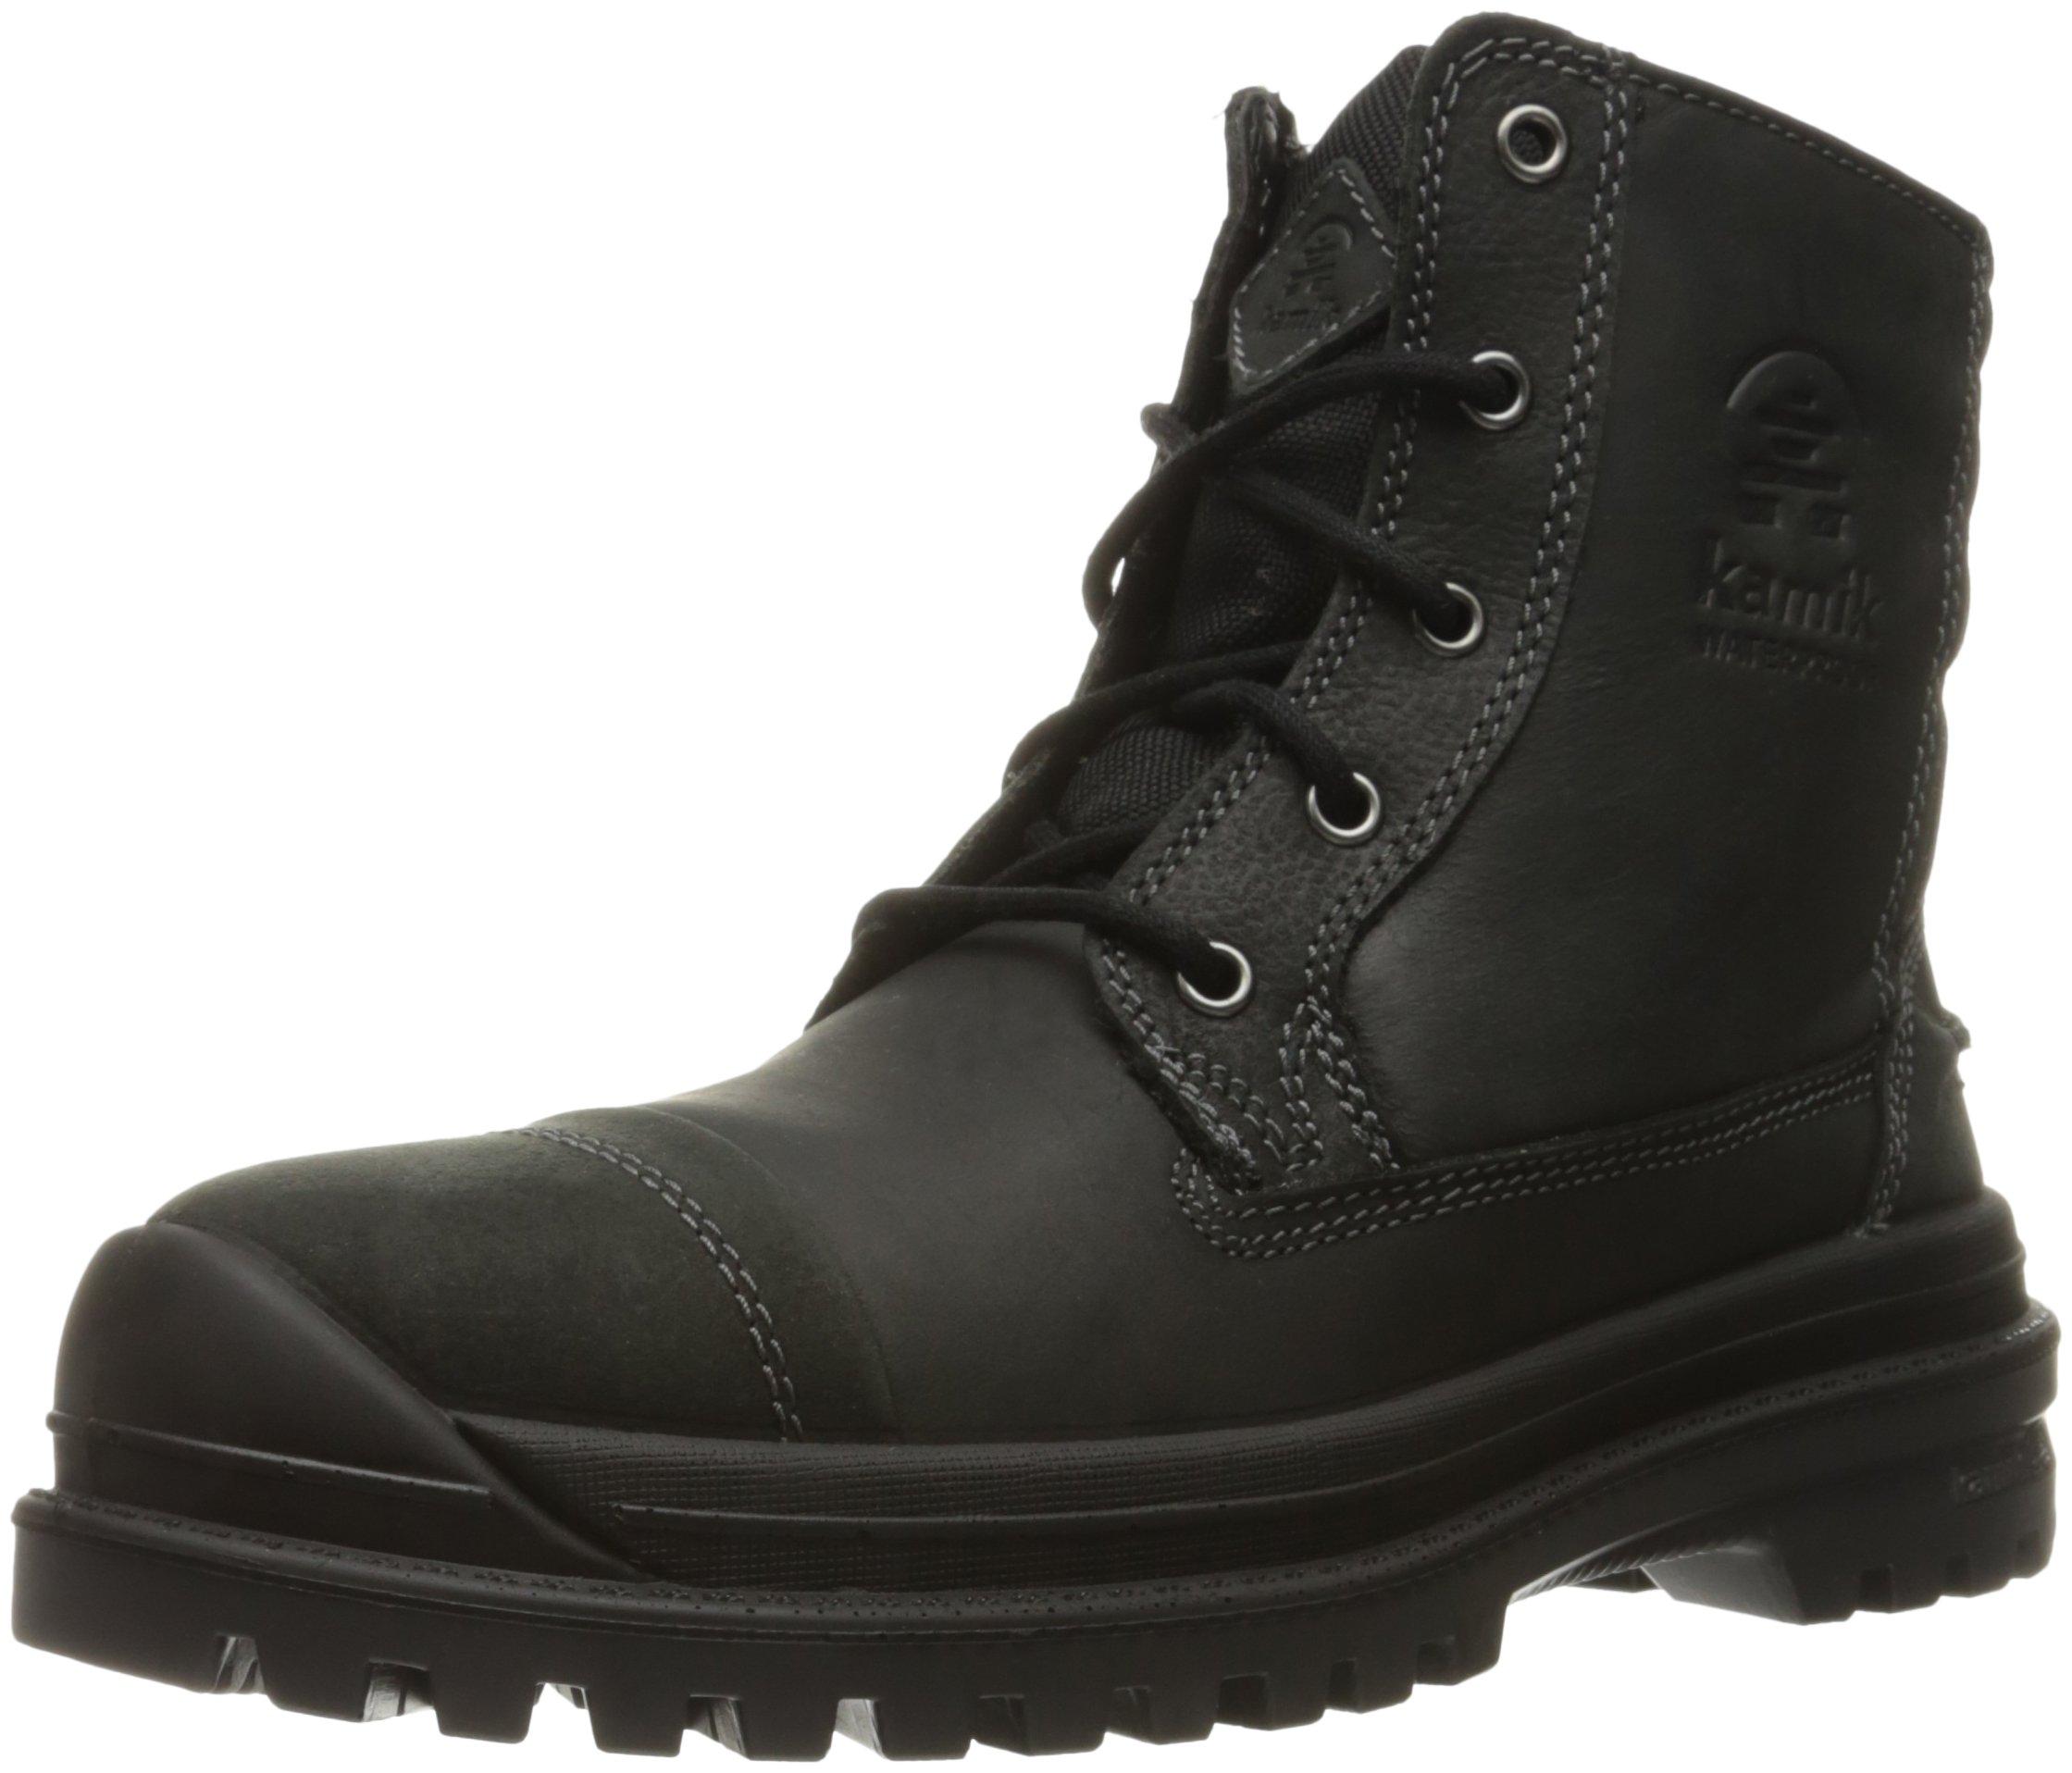 Kamik Men's Griffon Snow Boot, Black, 11 M US